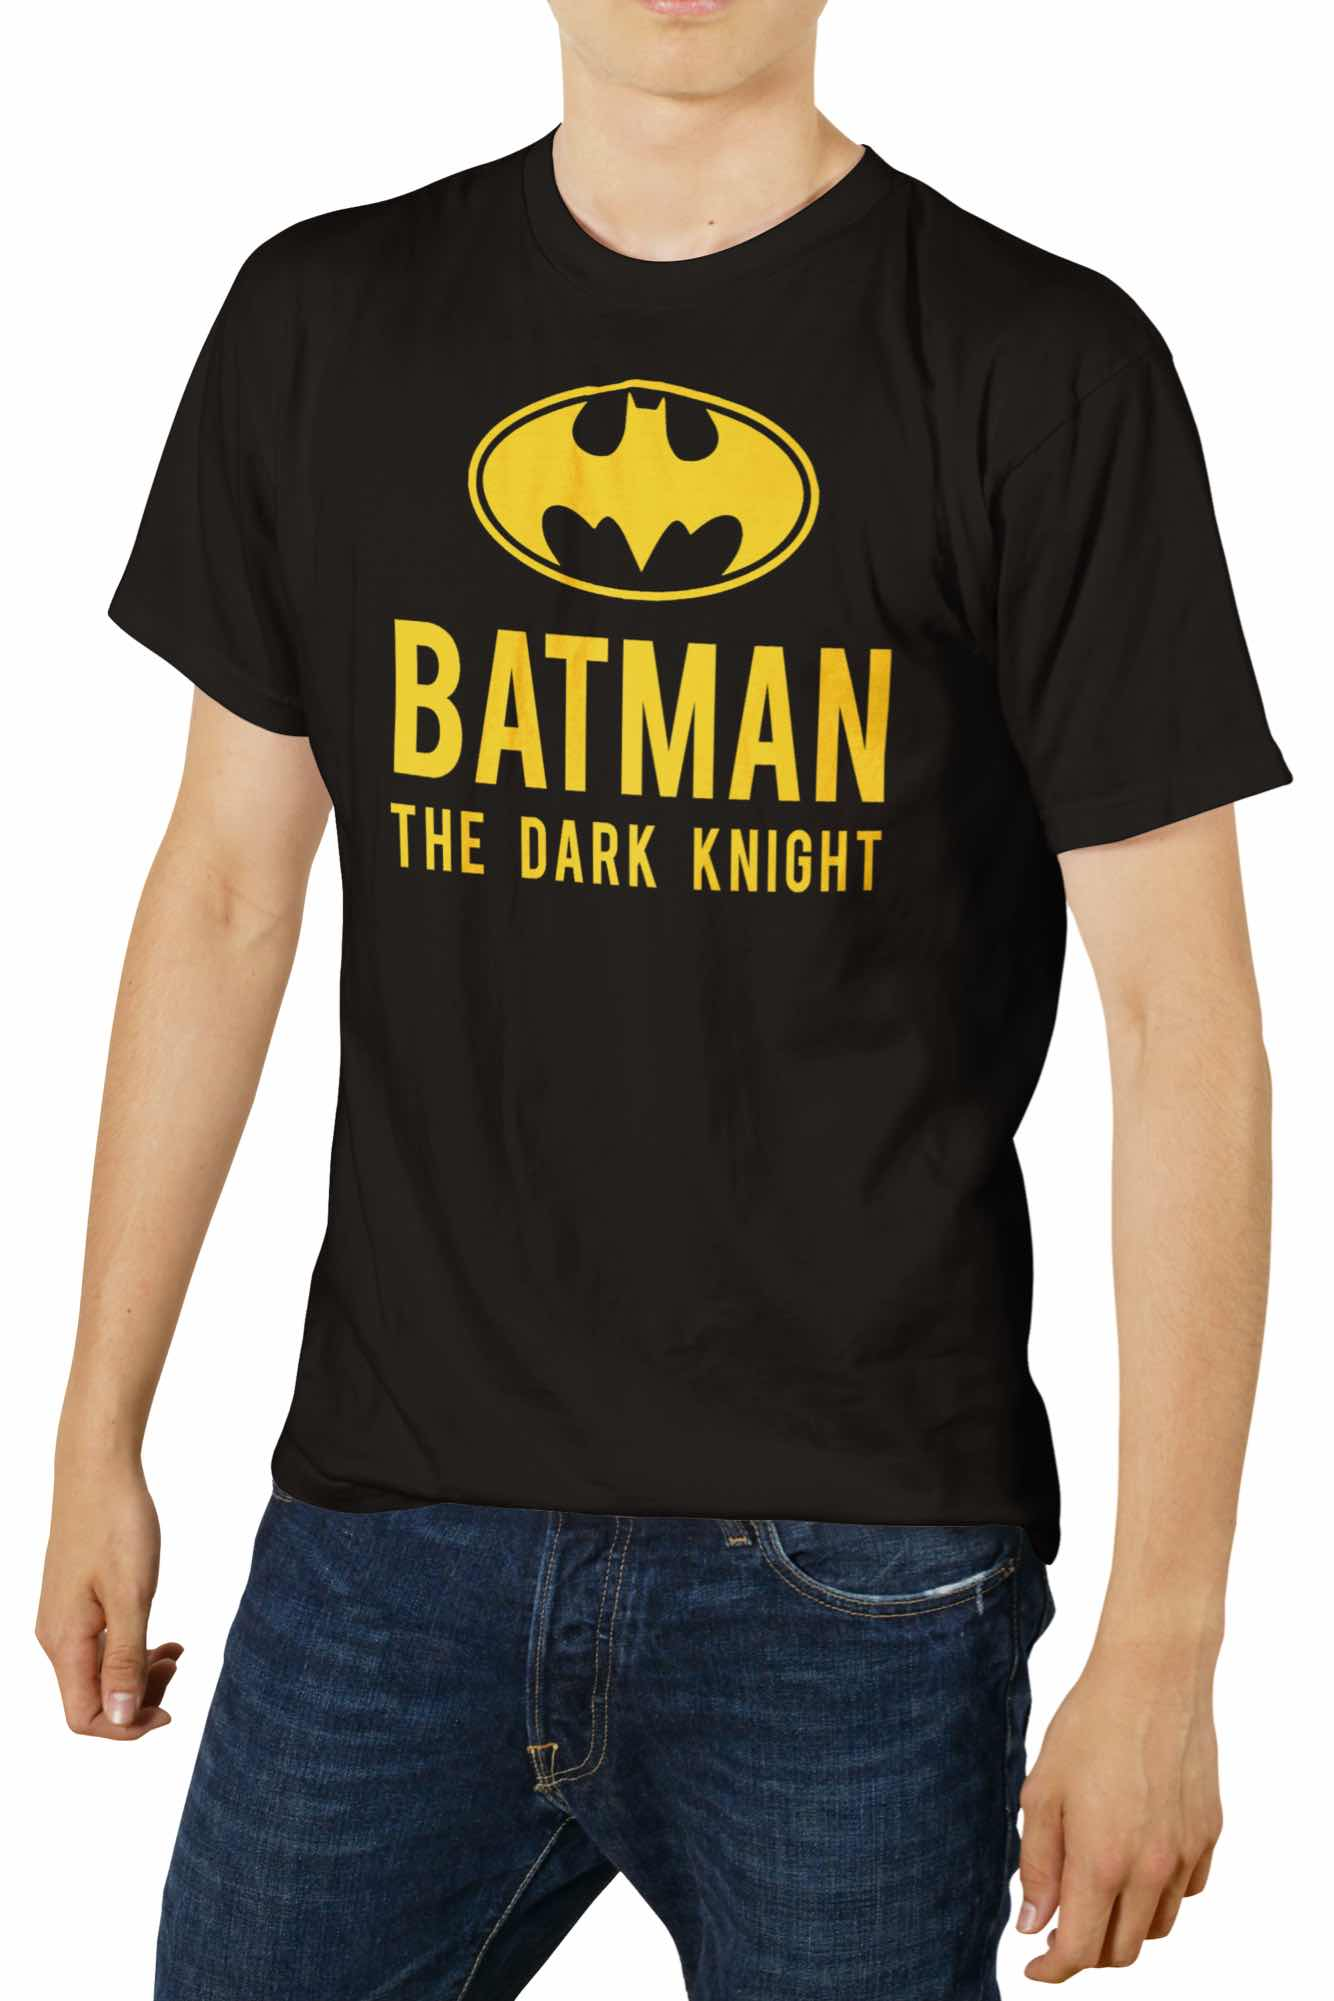 BATMAN THE DARK KNIGHT LOGO CAMISETA NEGRA CHICO T-M DC COMICS